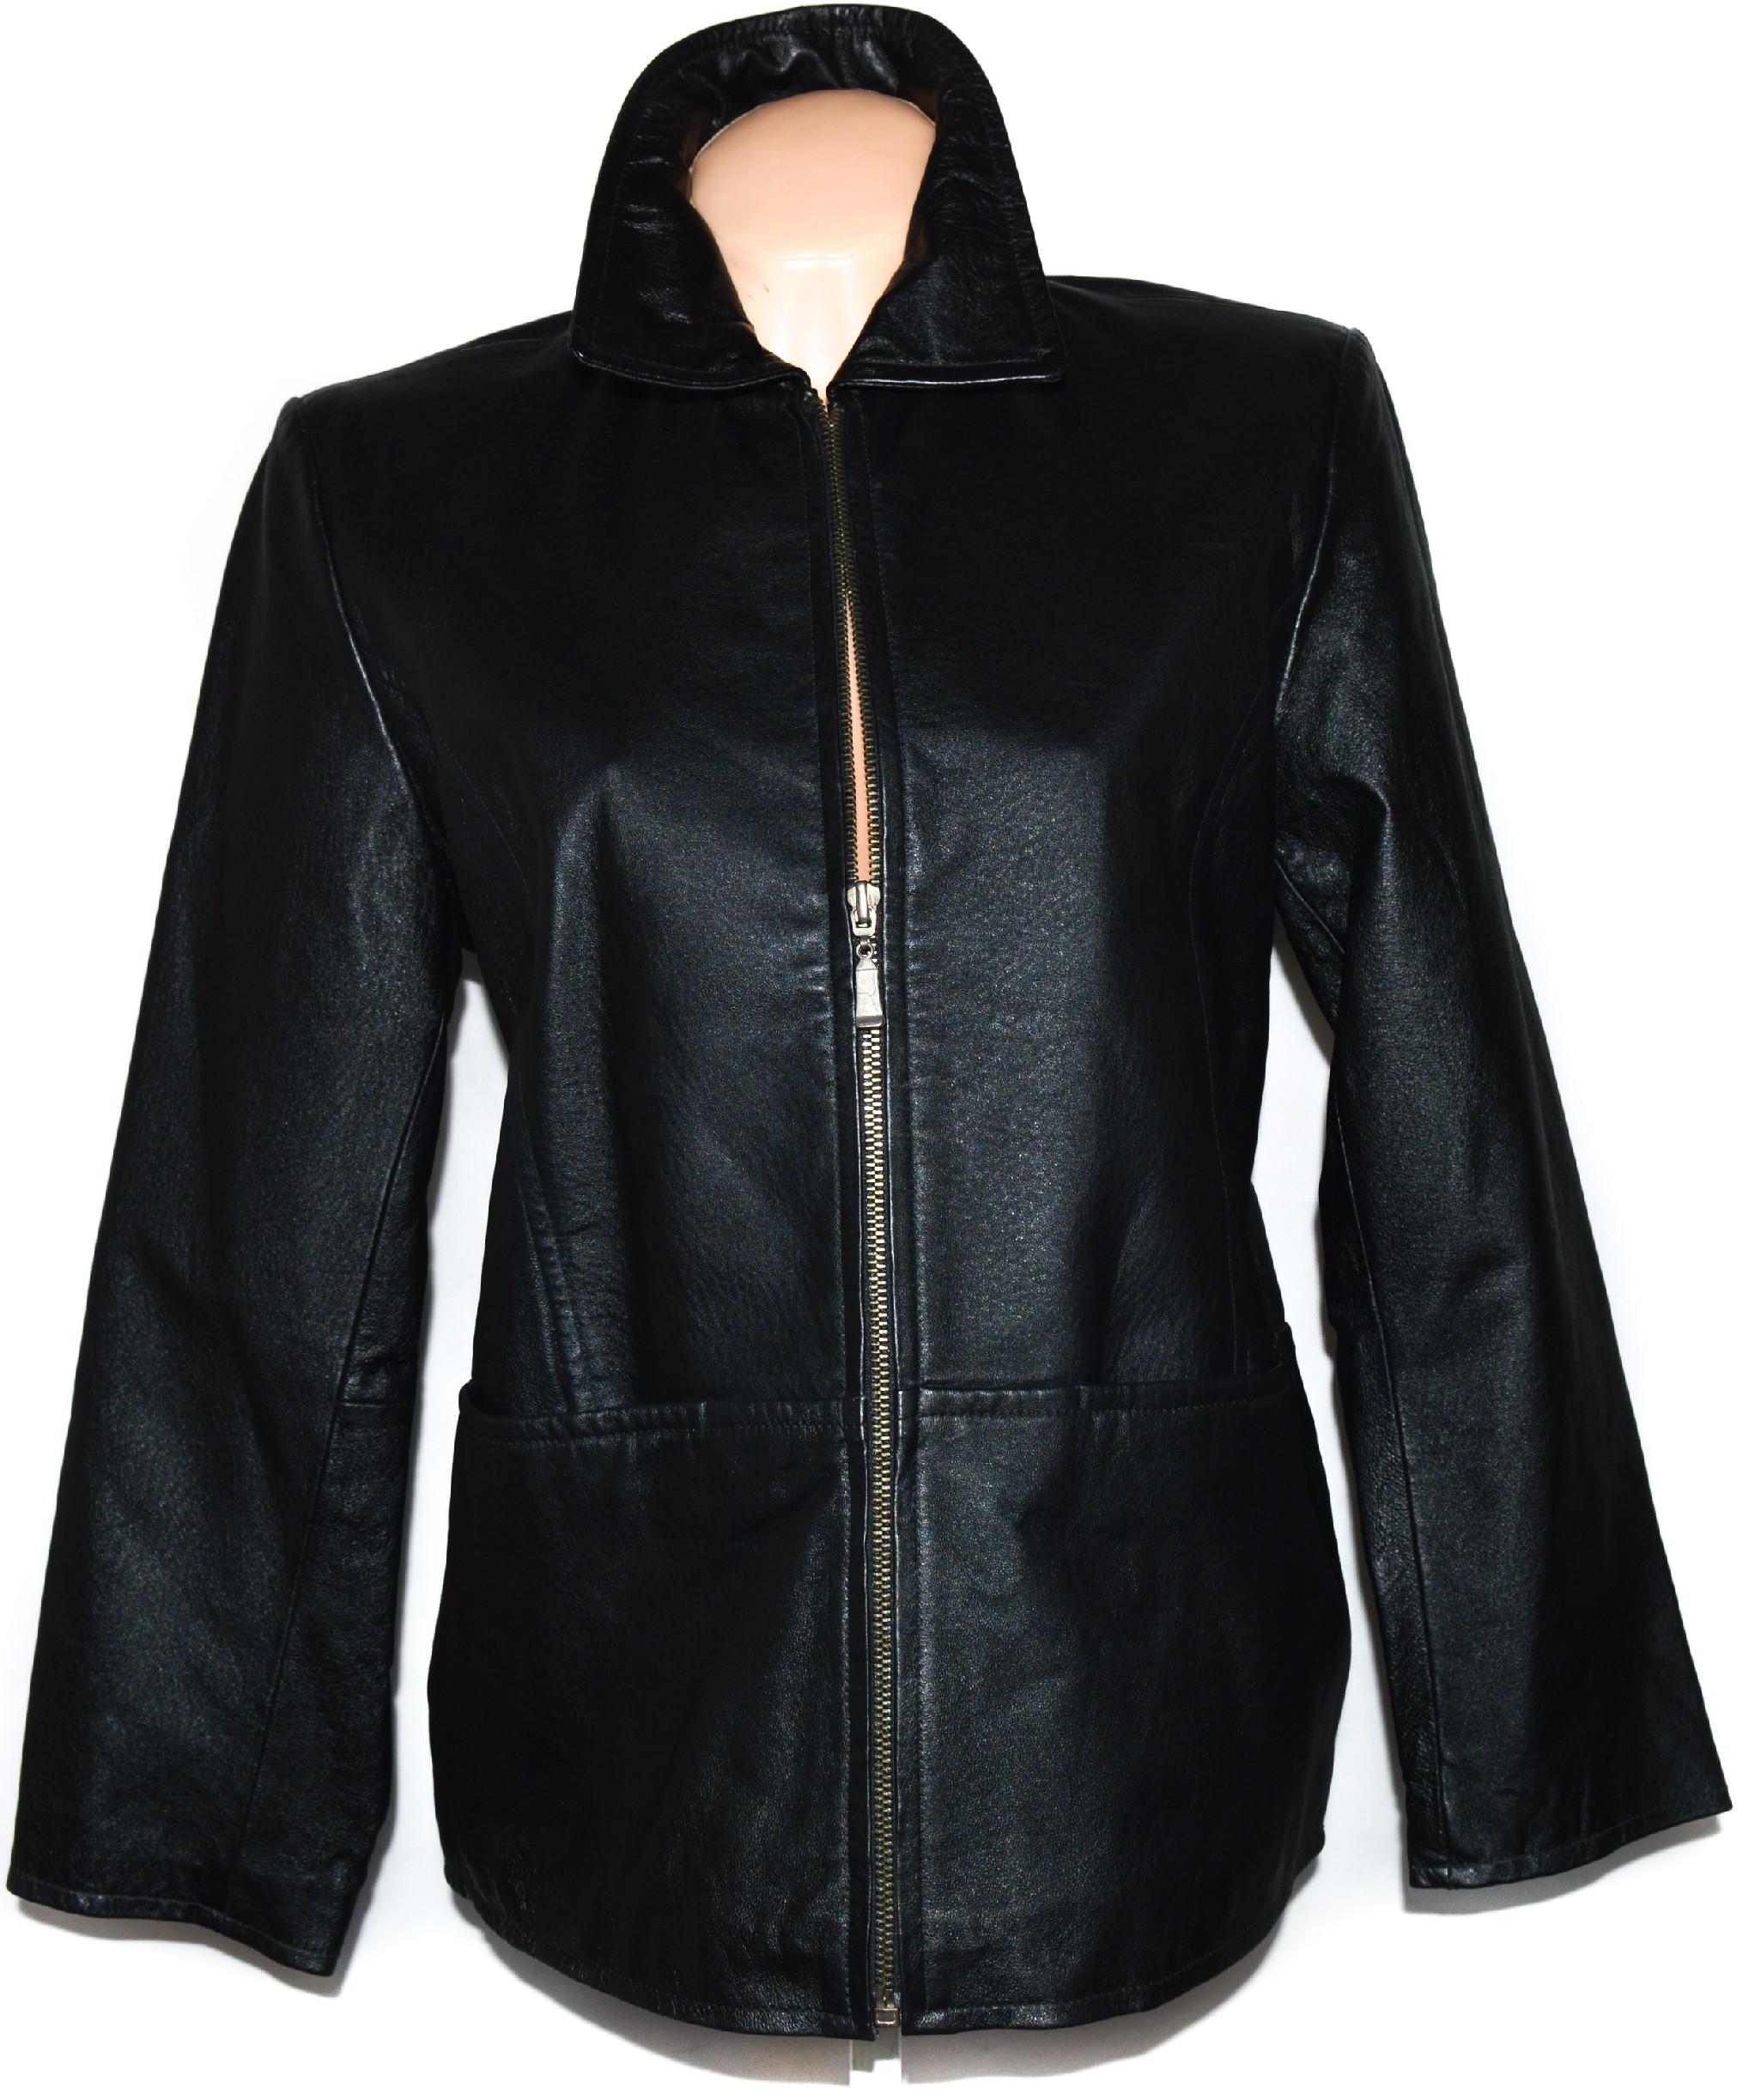 KOŽENÁ dámská černá bunda na zip XL